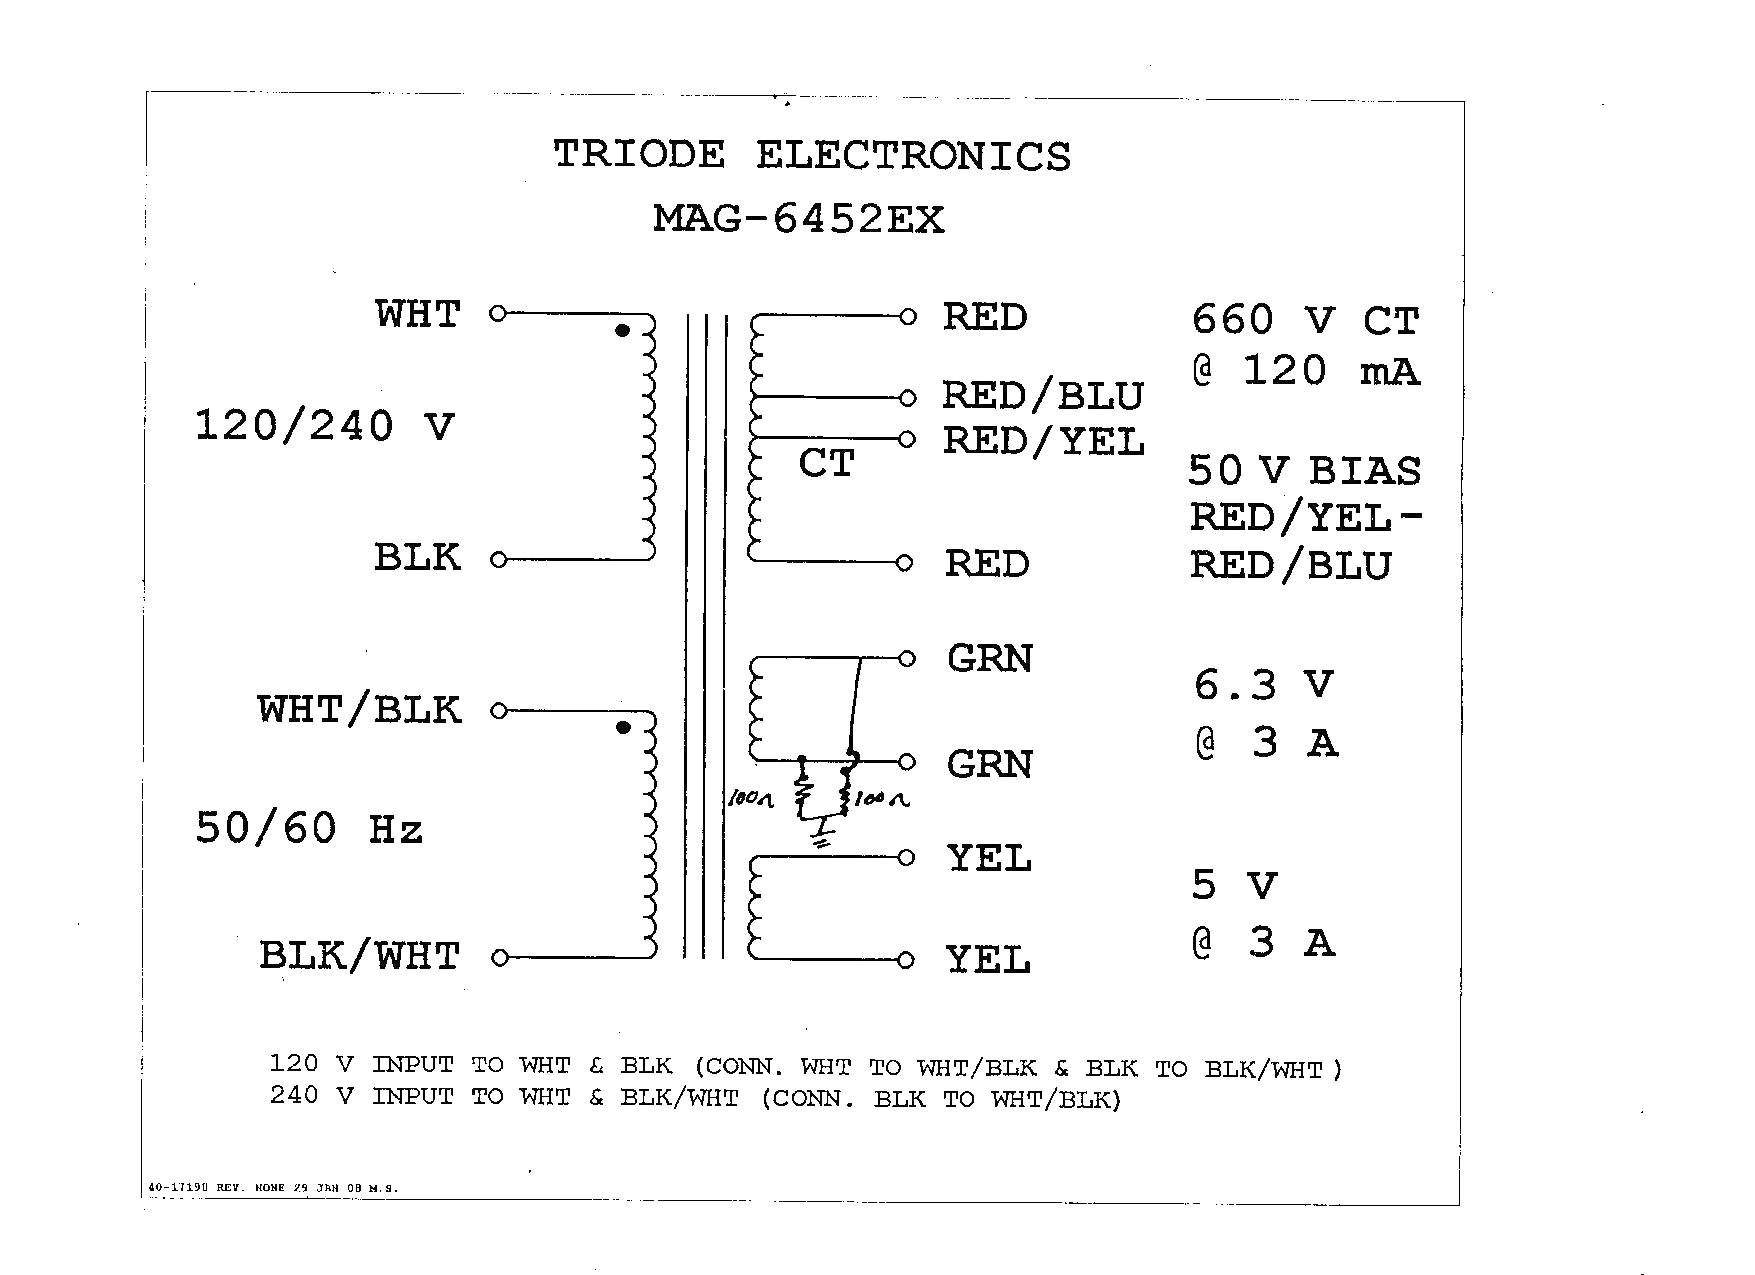 45 kva transformer wiring diagram Collection-Kva Transformer Wiring Transformer Wire Diagram Wiring Diagrams Schematics Fancy 75 14-p